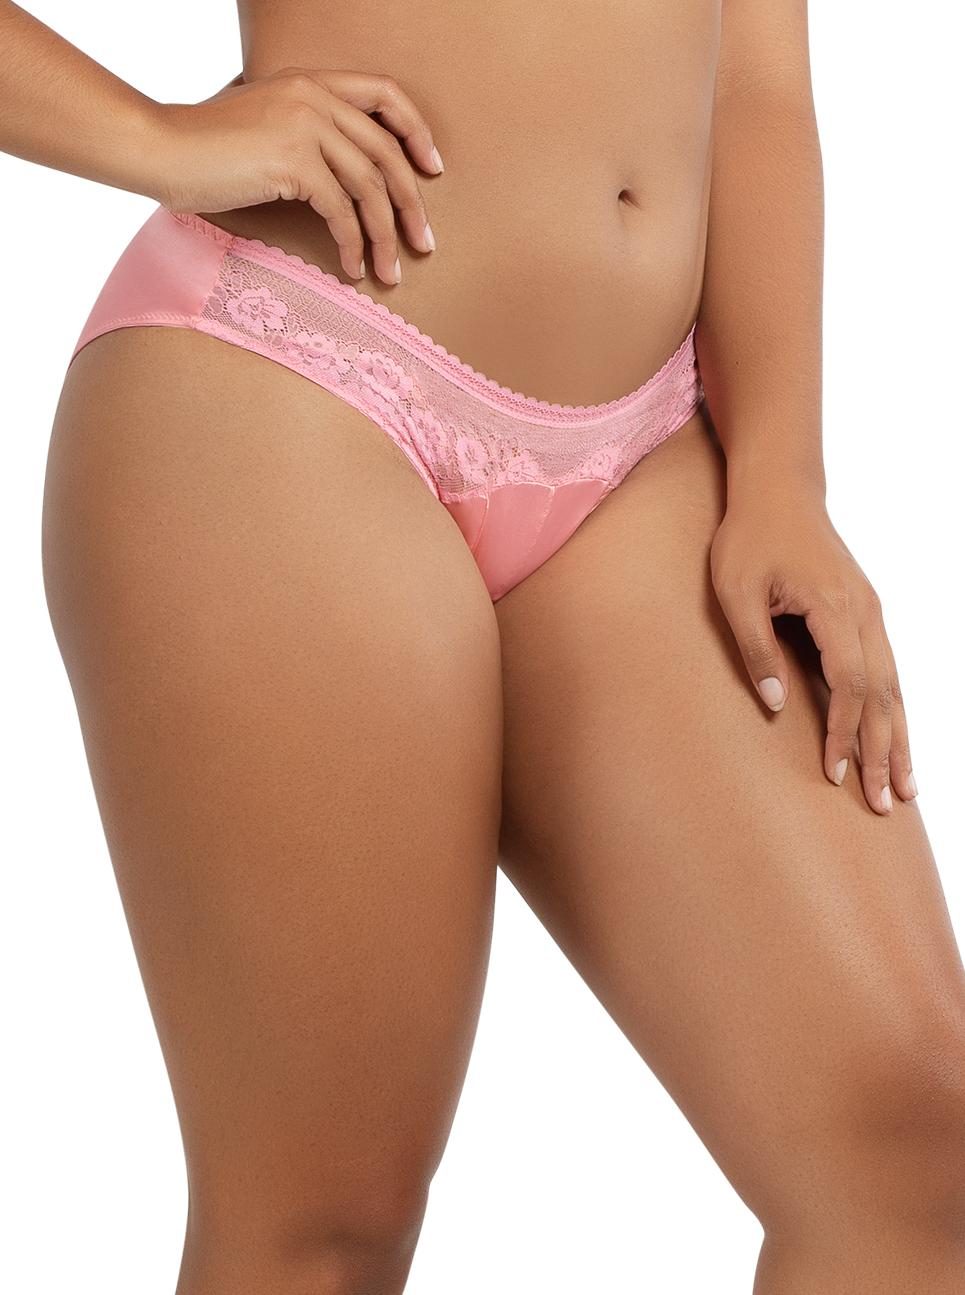 PARFAIT Jade BikiniA1653 FlamingoPink Side - Jade Bikini Flamingo Pink P1653